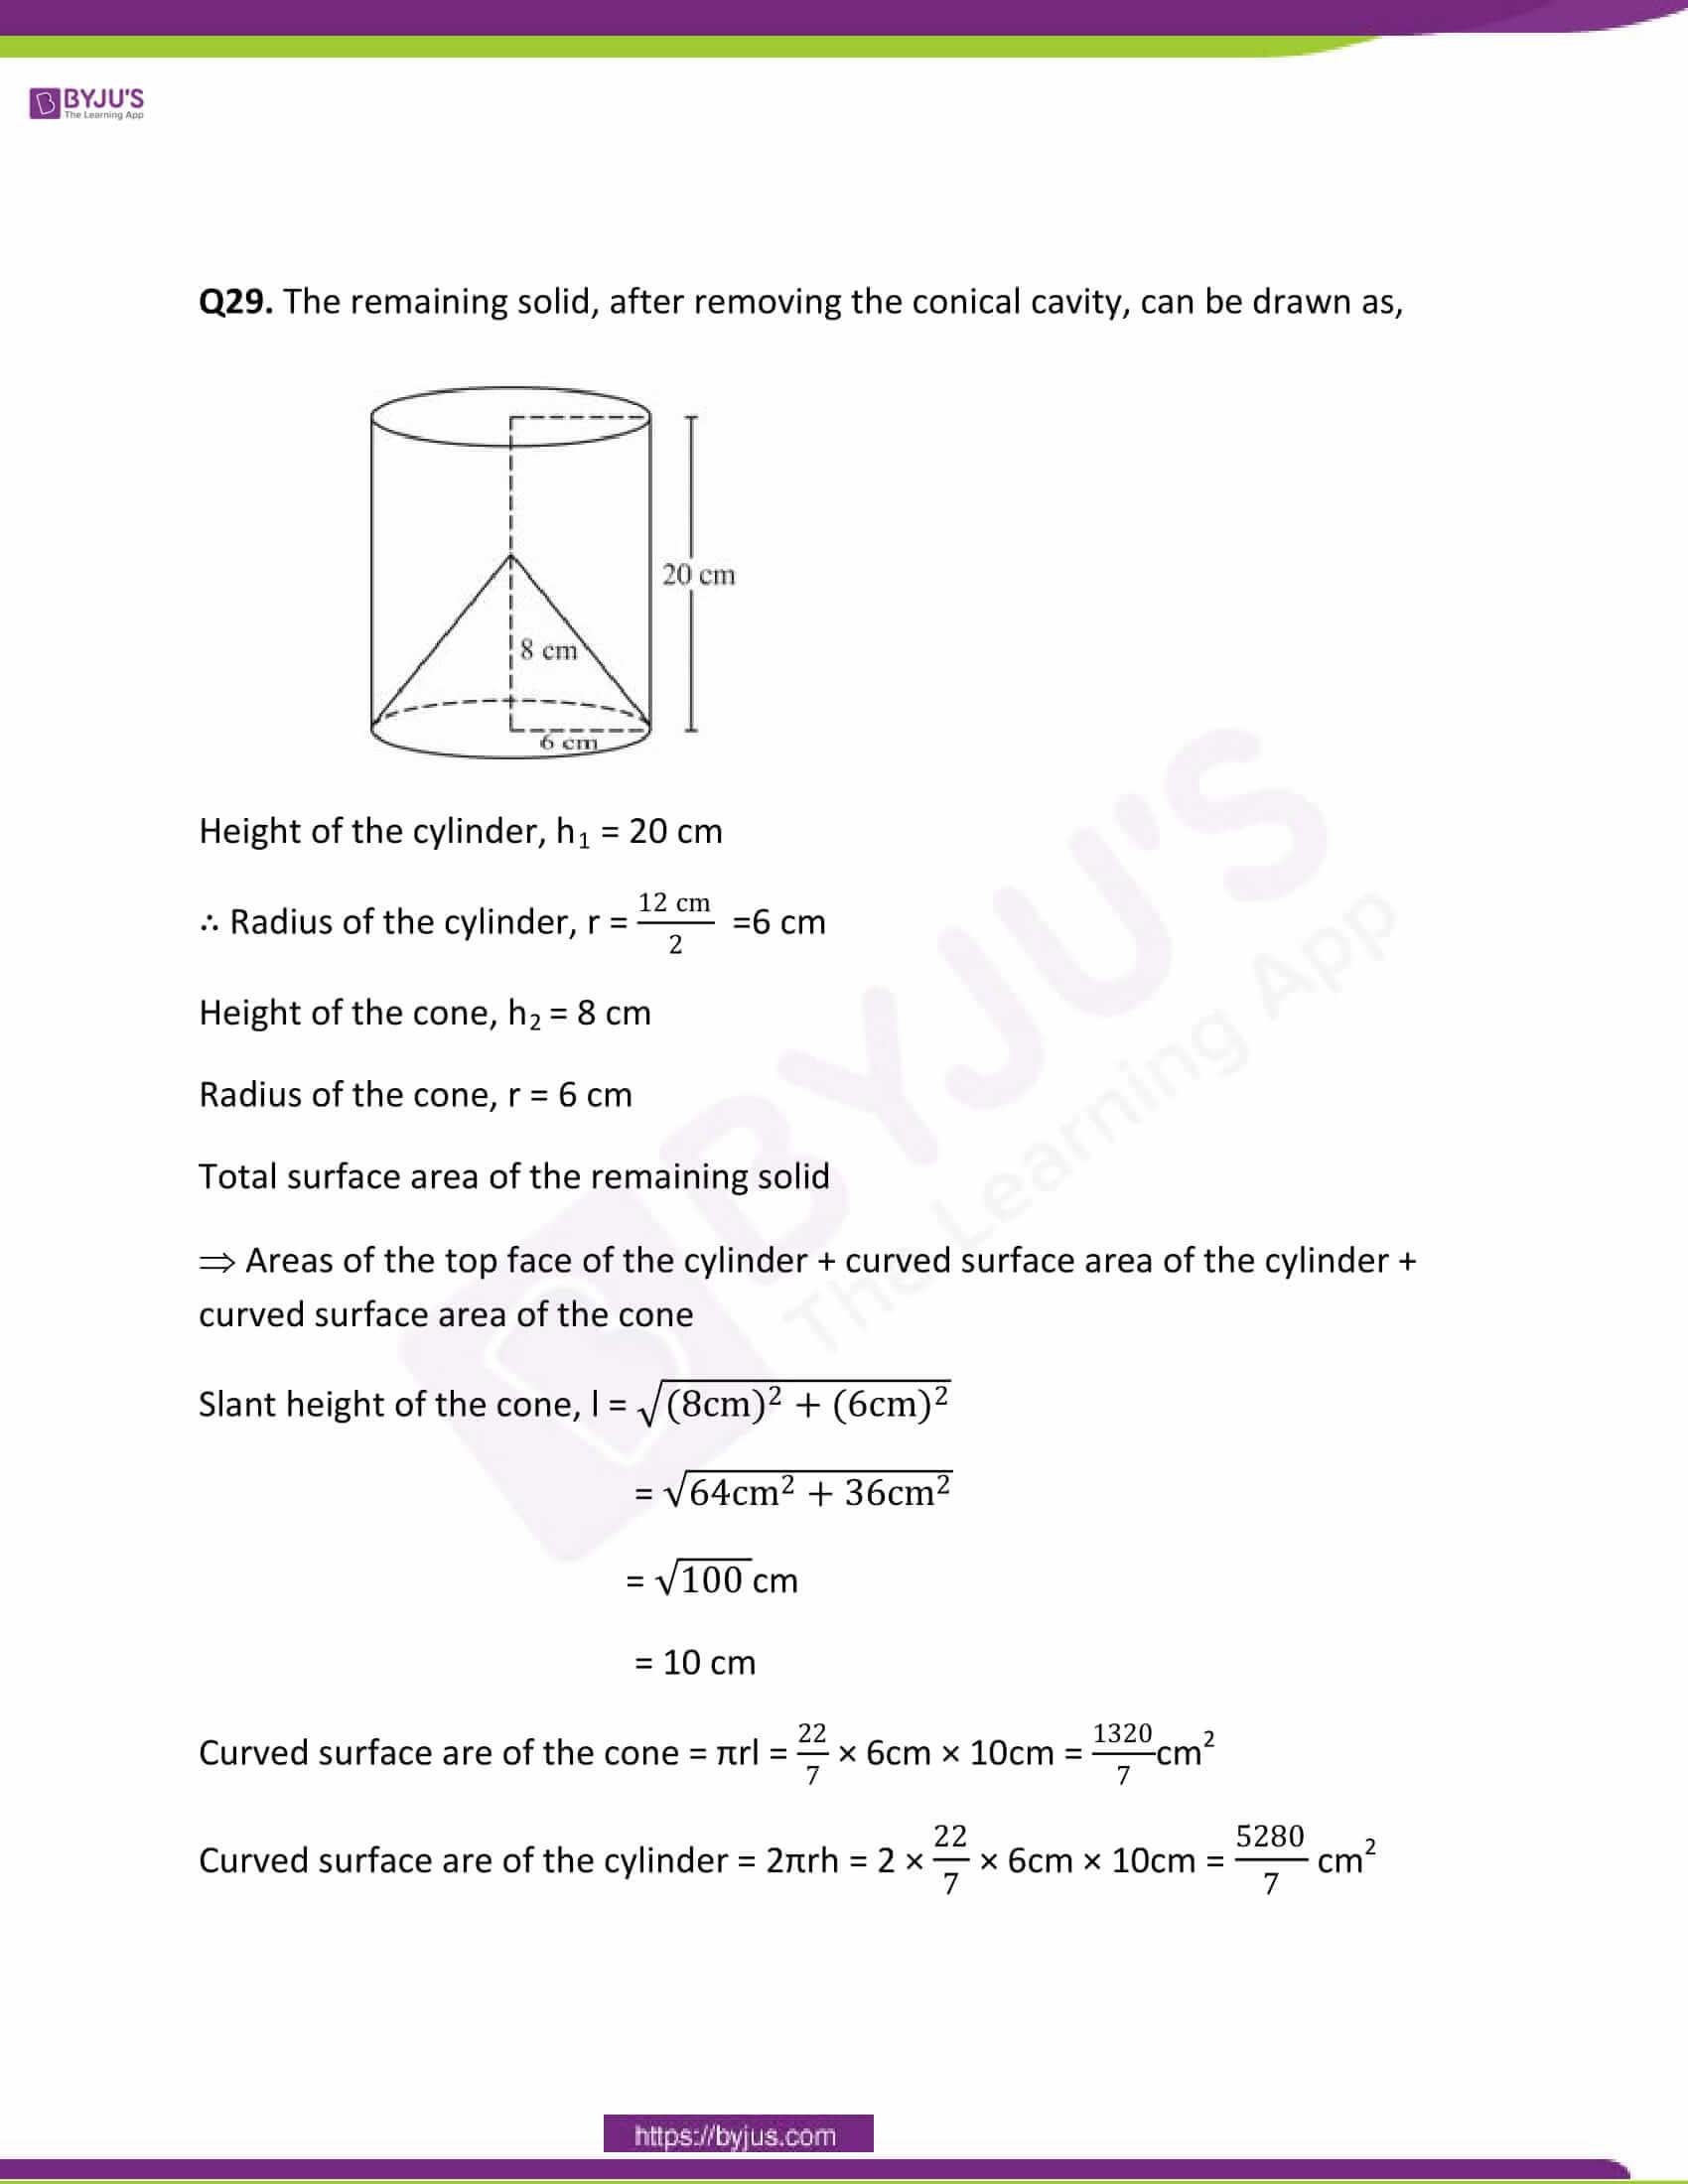 CBSE Class 10 Maths Papers Solution 2011 22